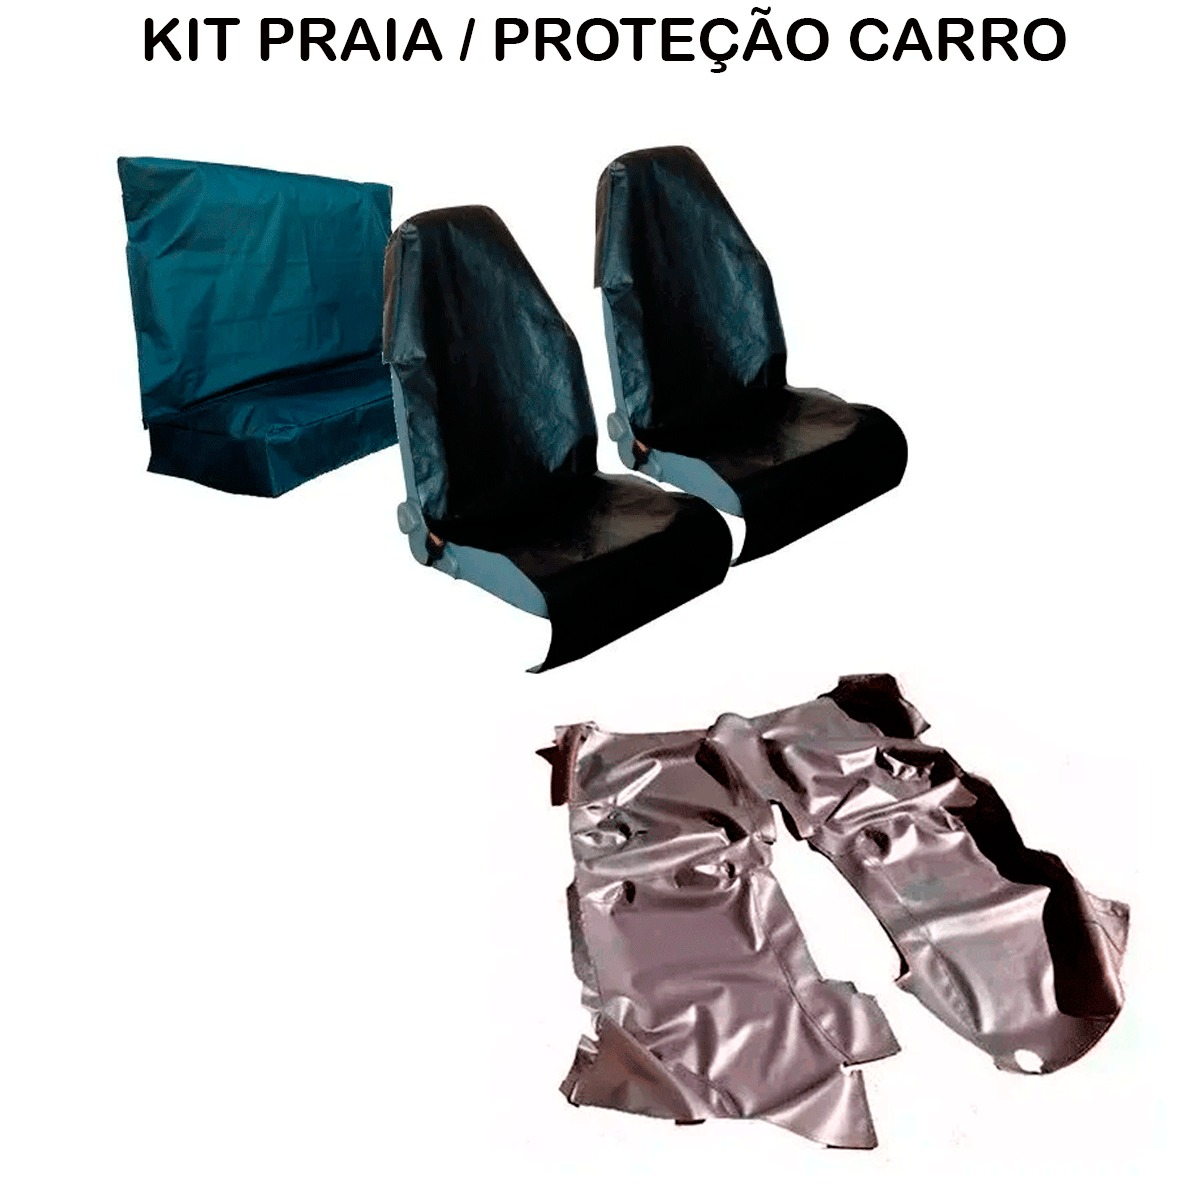 Tapete Em Vinil Volkswagen Gol G2 + Capa Banco Protecao Banco Areia Suor Academia